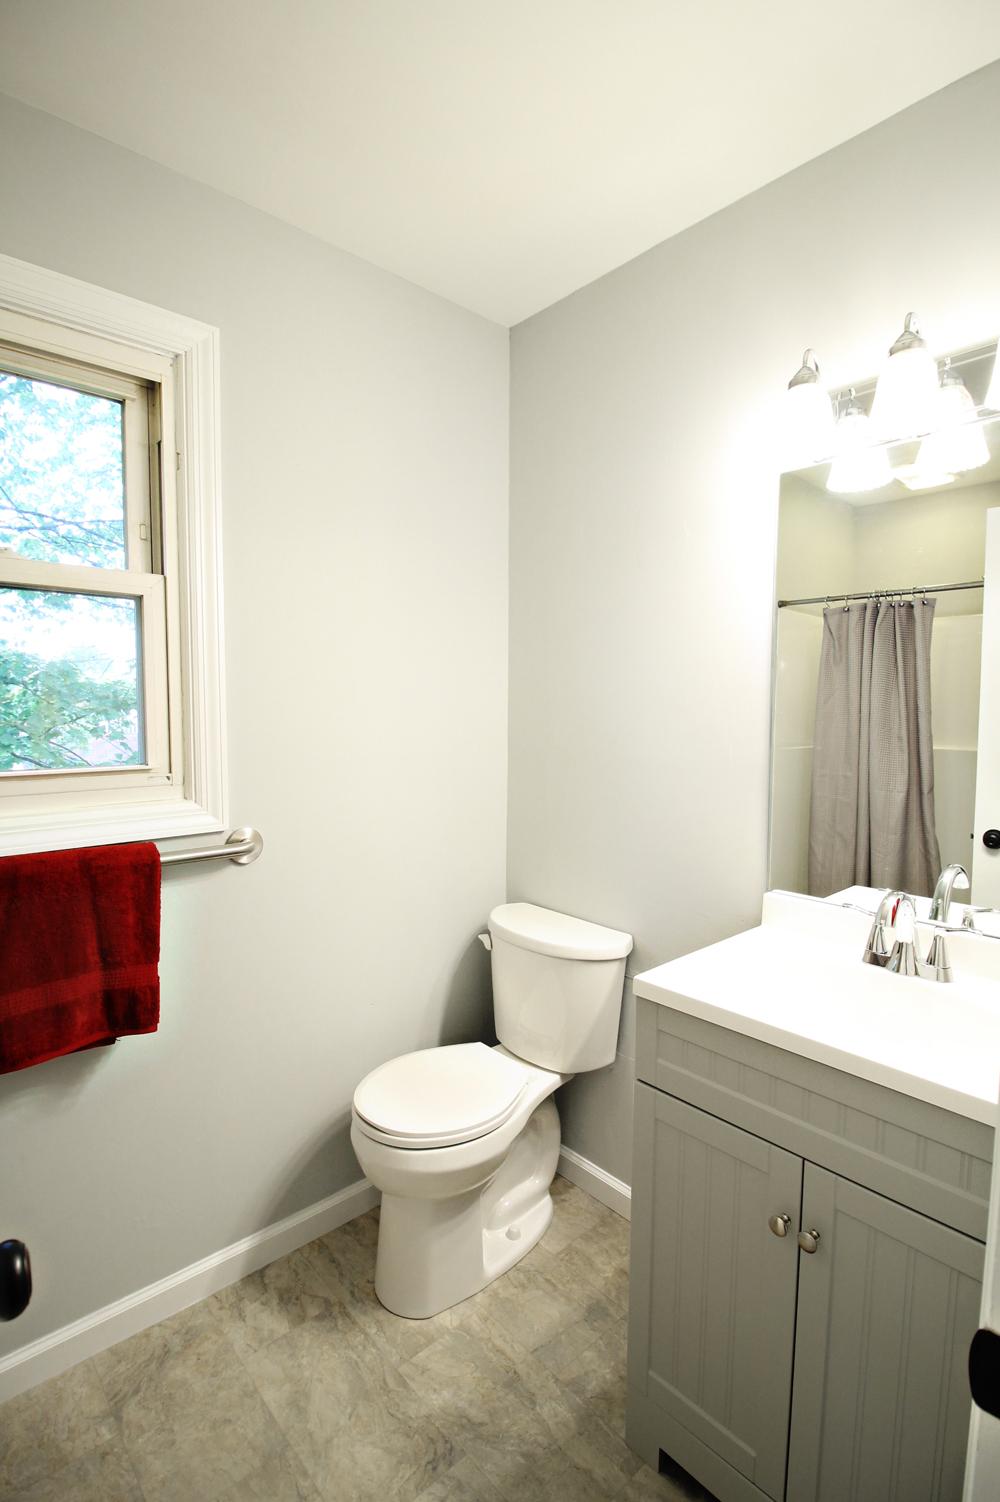 21 - Master Bath with shower_OakSt.jpg